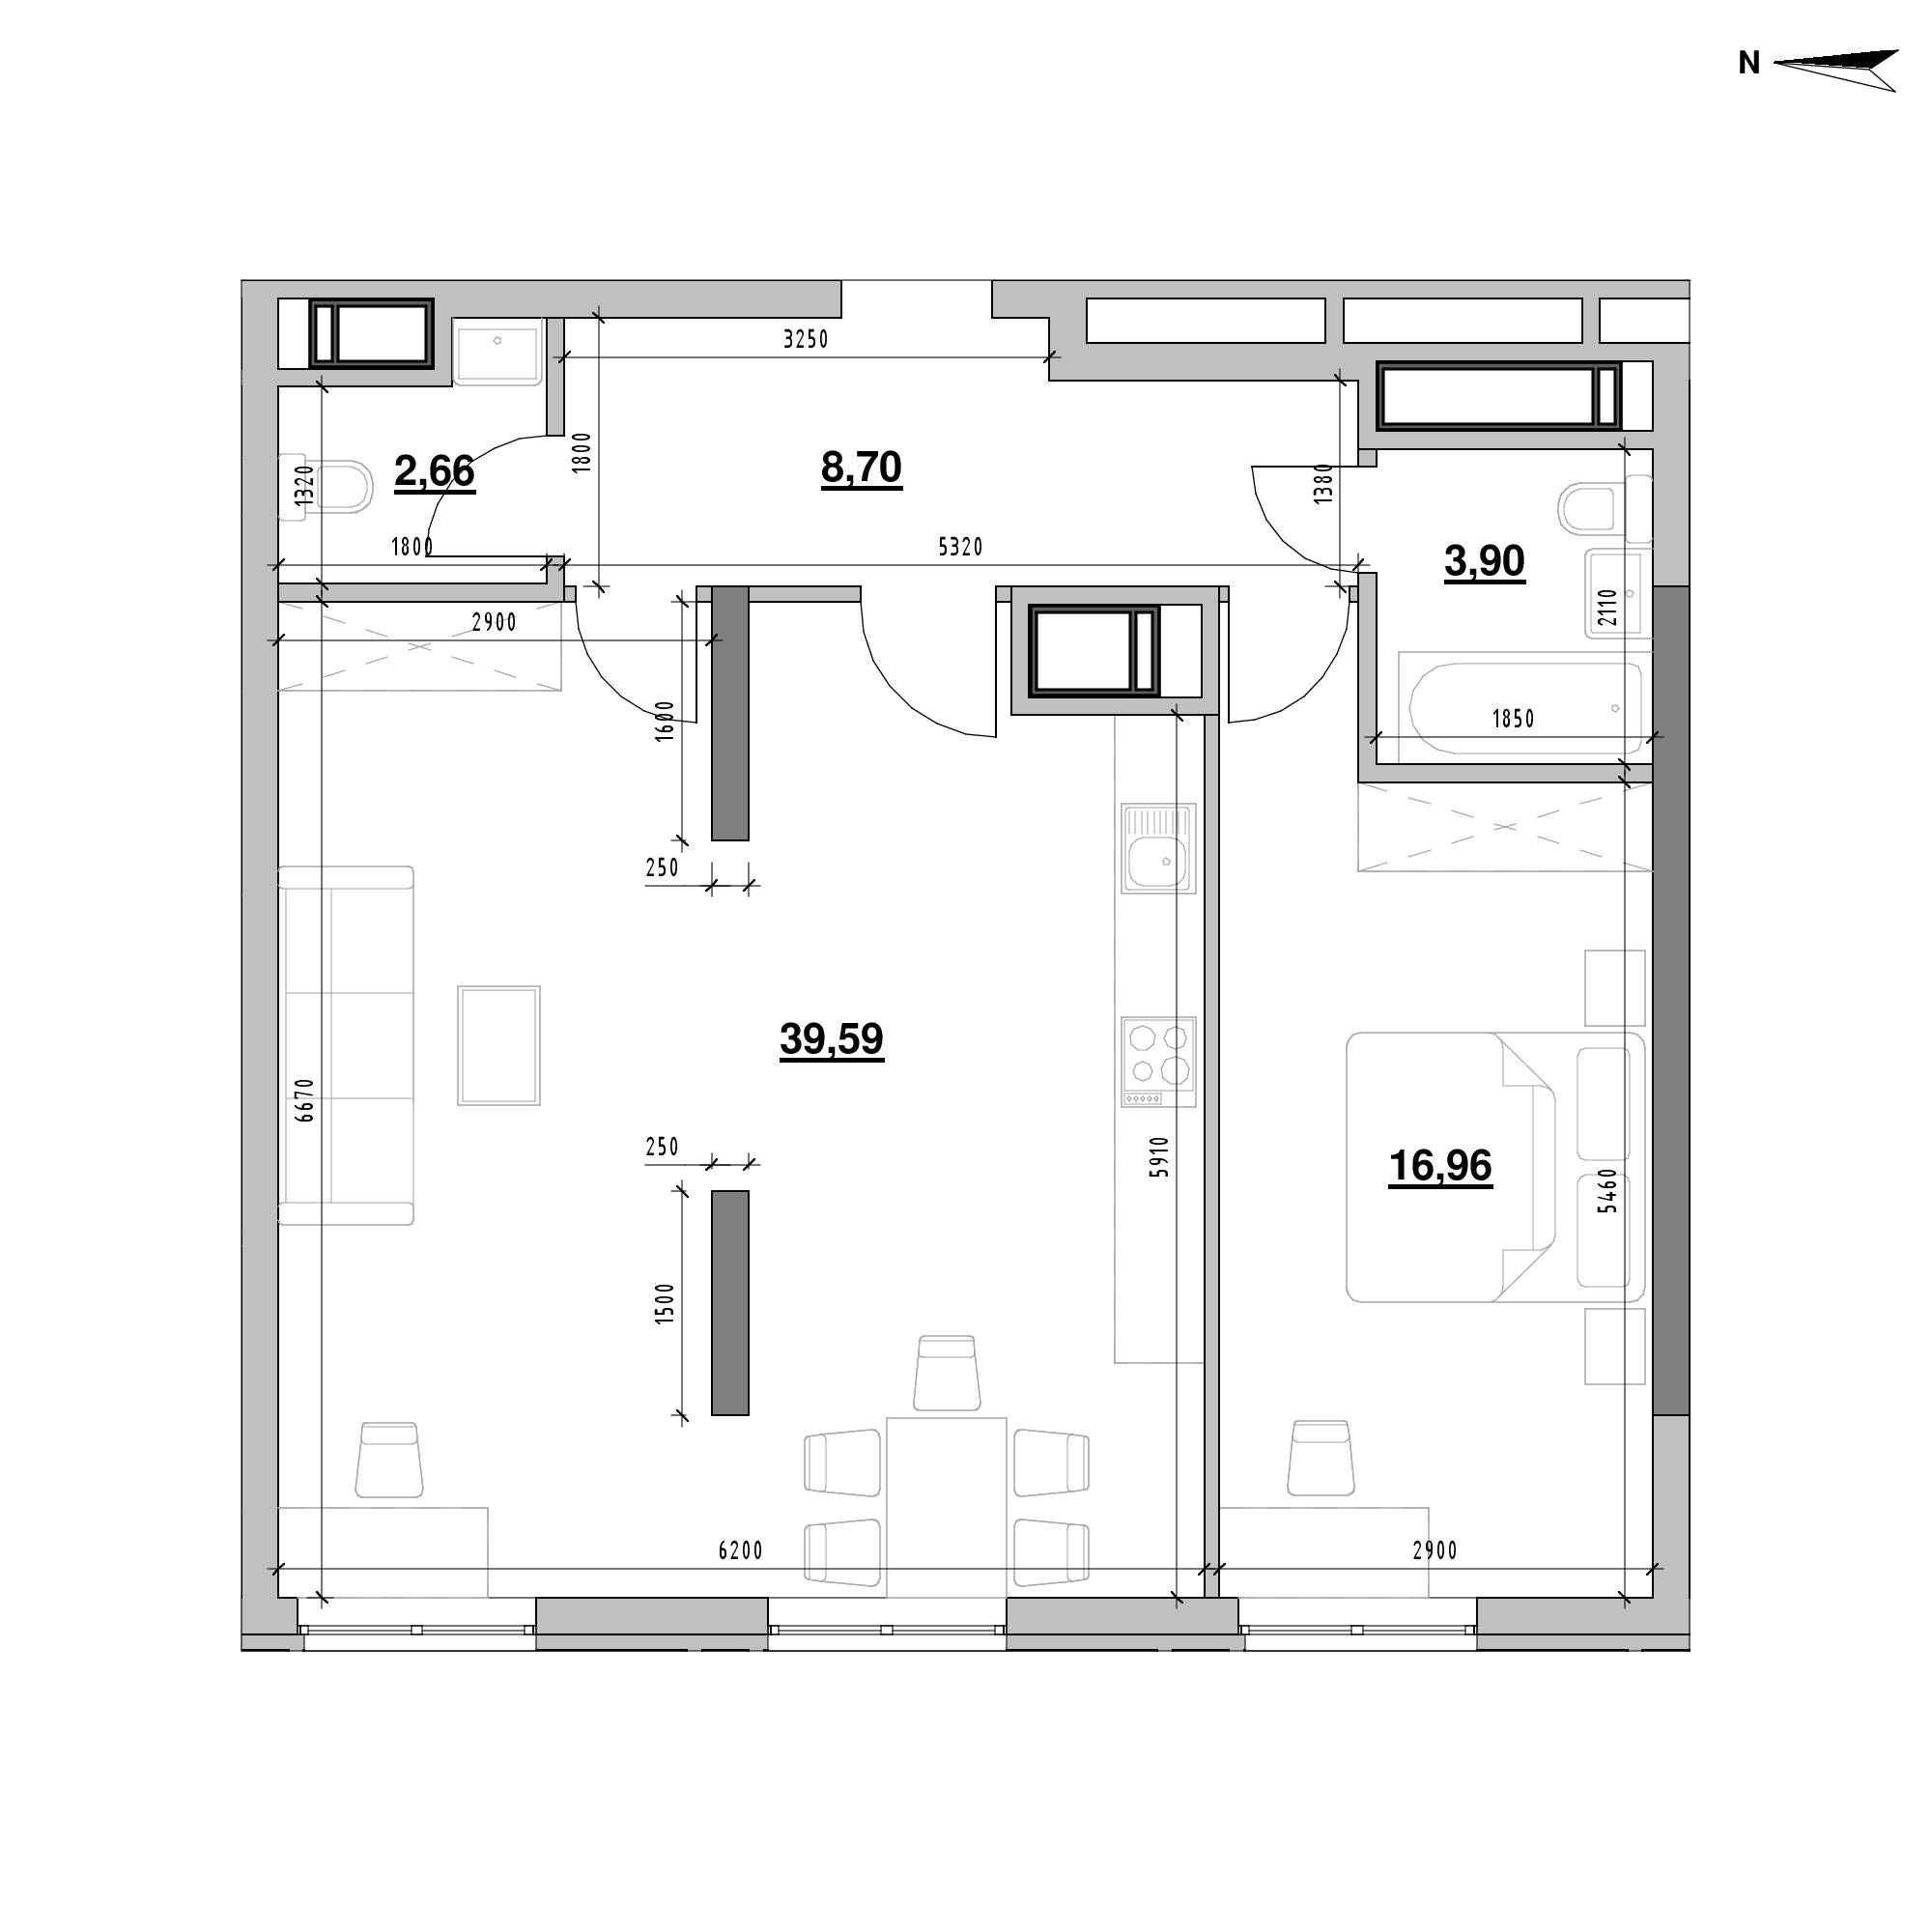 ЖК Nordica Residence: планування 1-кімнатної квартири, №166, 71.89 м<sup>2</sup>